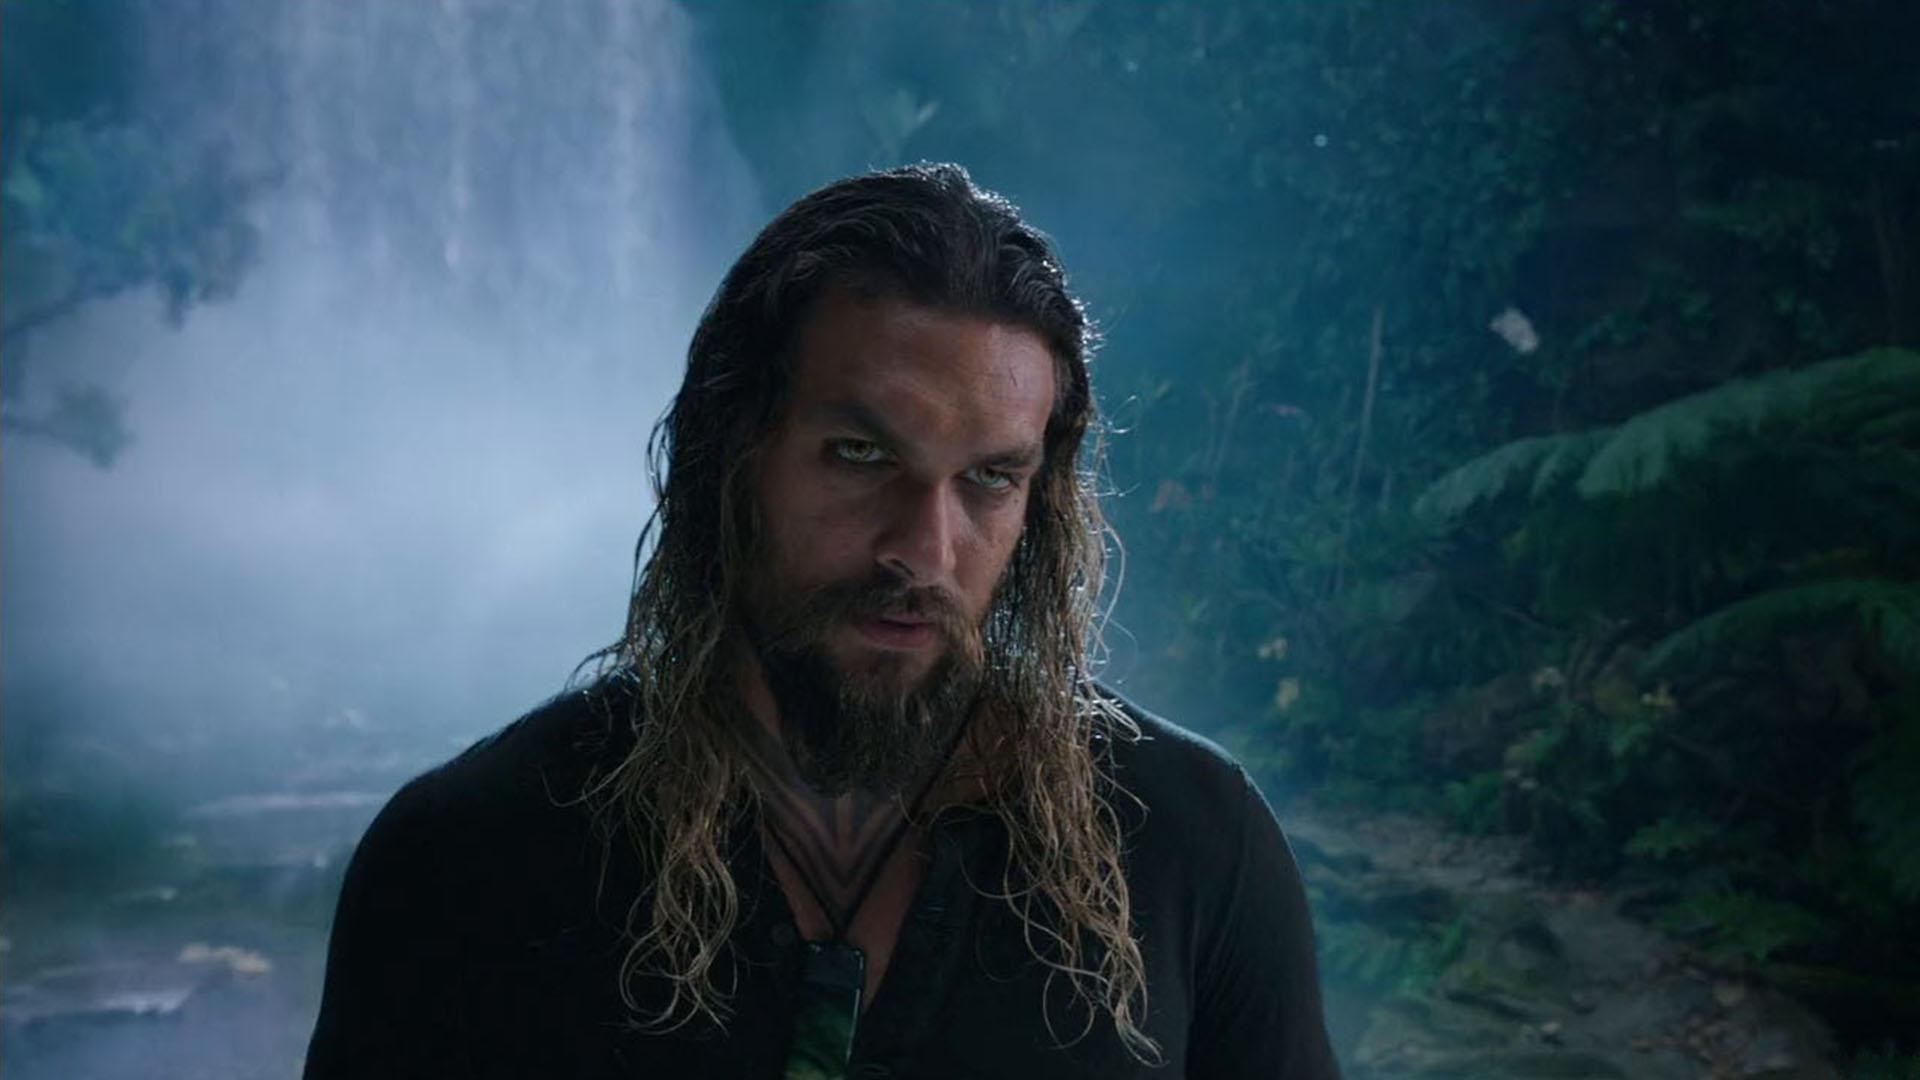 Aquaman | 2018 | IMAX | BDRip | XviD | Türkçe Dublaj | 4K - 720p - 1080p - m720p - m1080p | BluRay | Dual | TR-EN | Tek Link